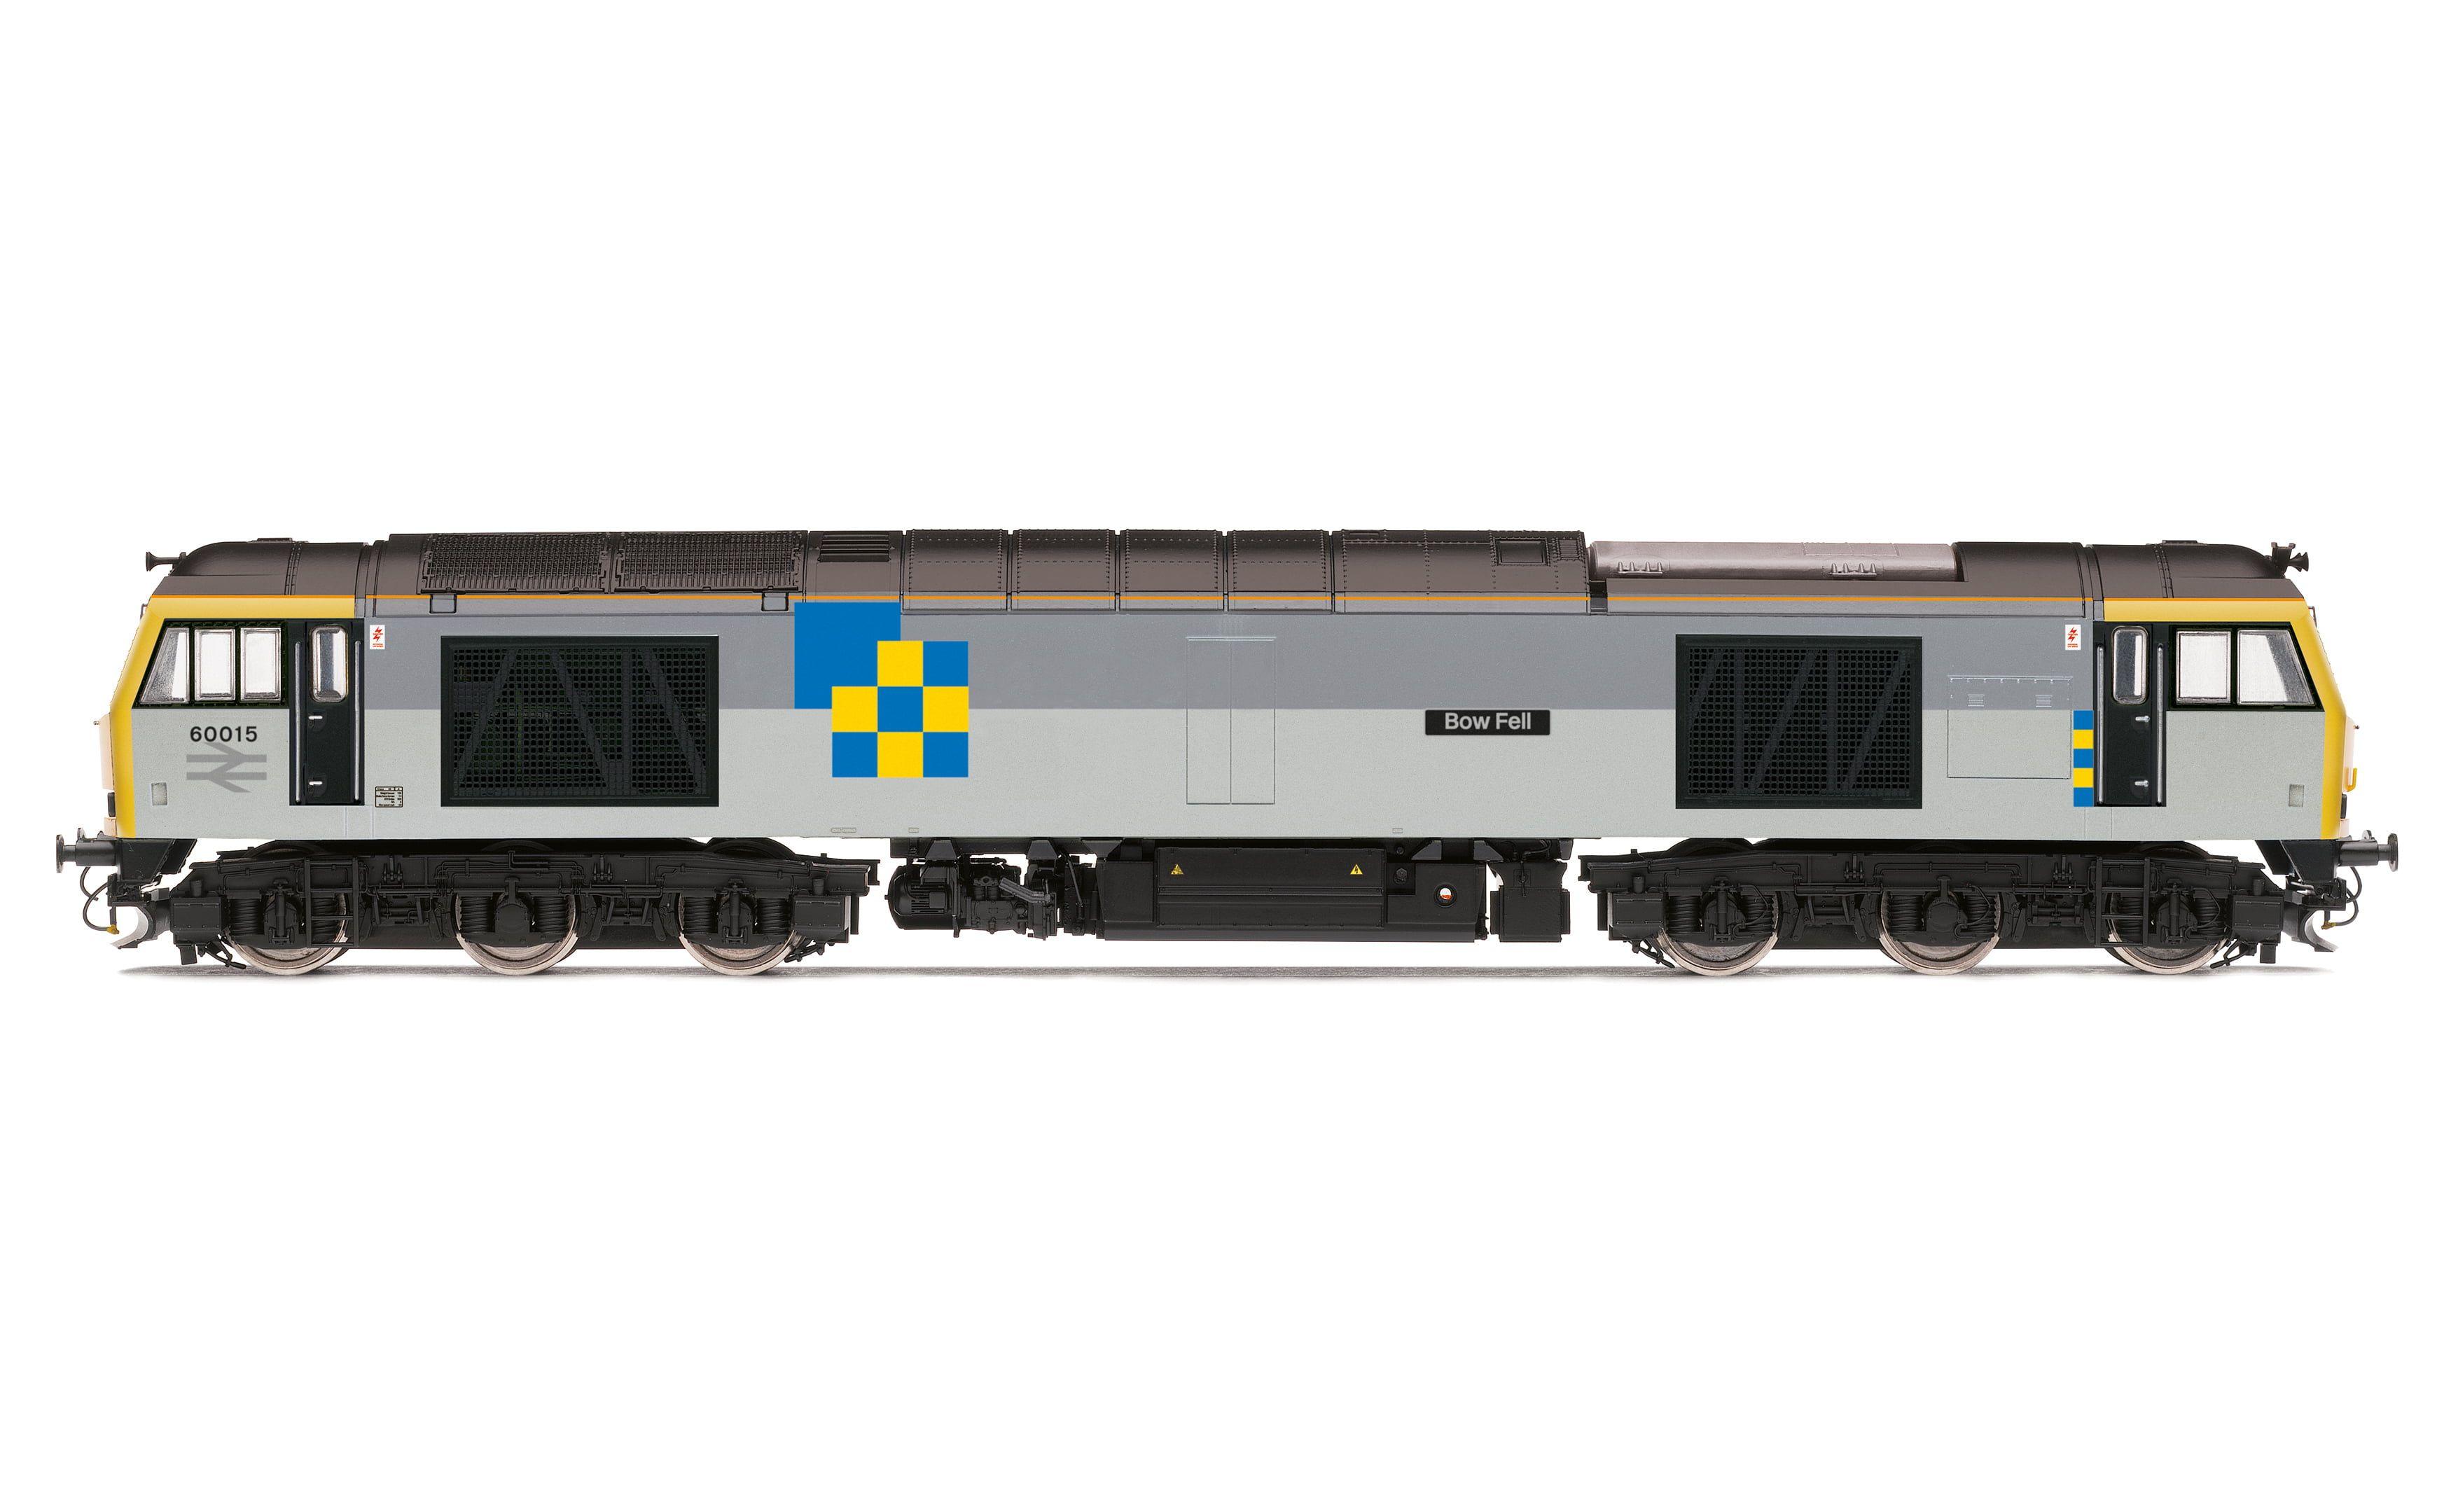 BR Railfreight, Class 60, Co-Co, 60015 'Bow Fell' - Era 8